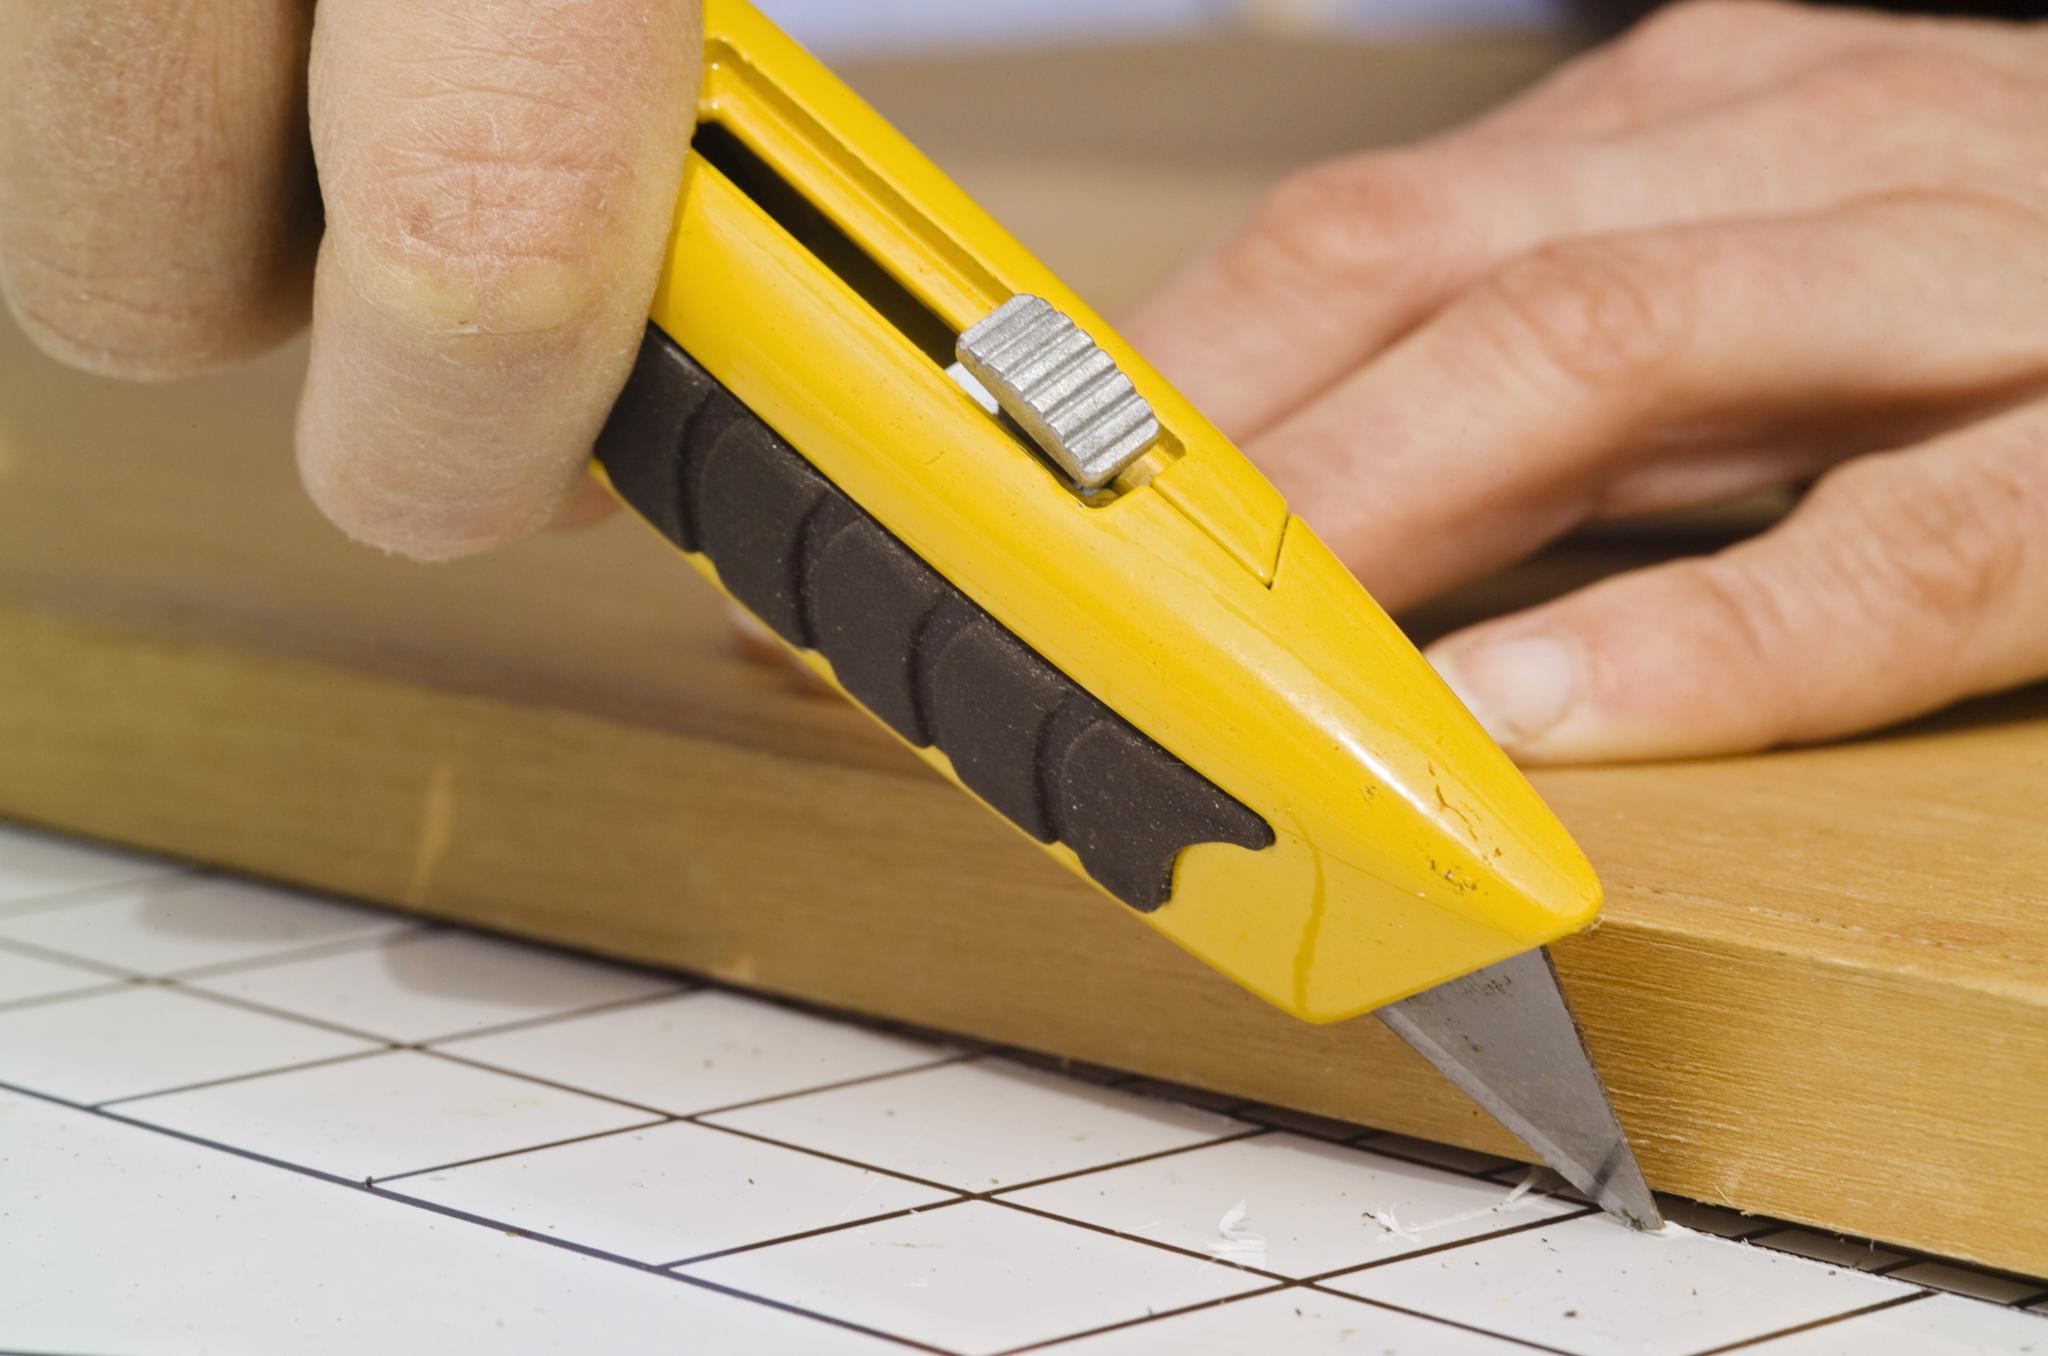 cutting-the-acrylic-sheet